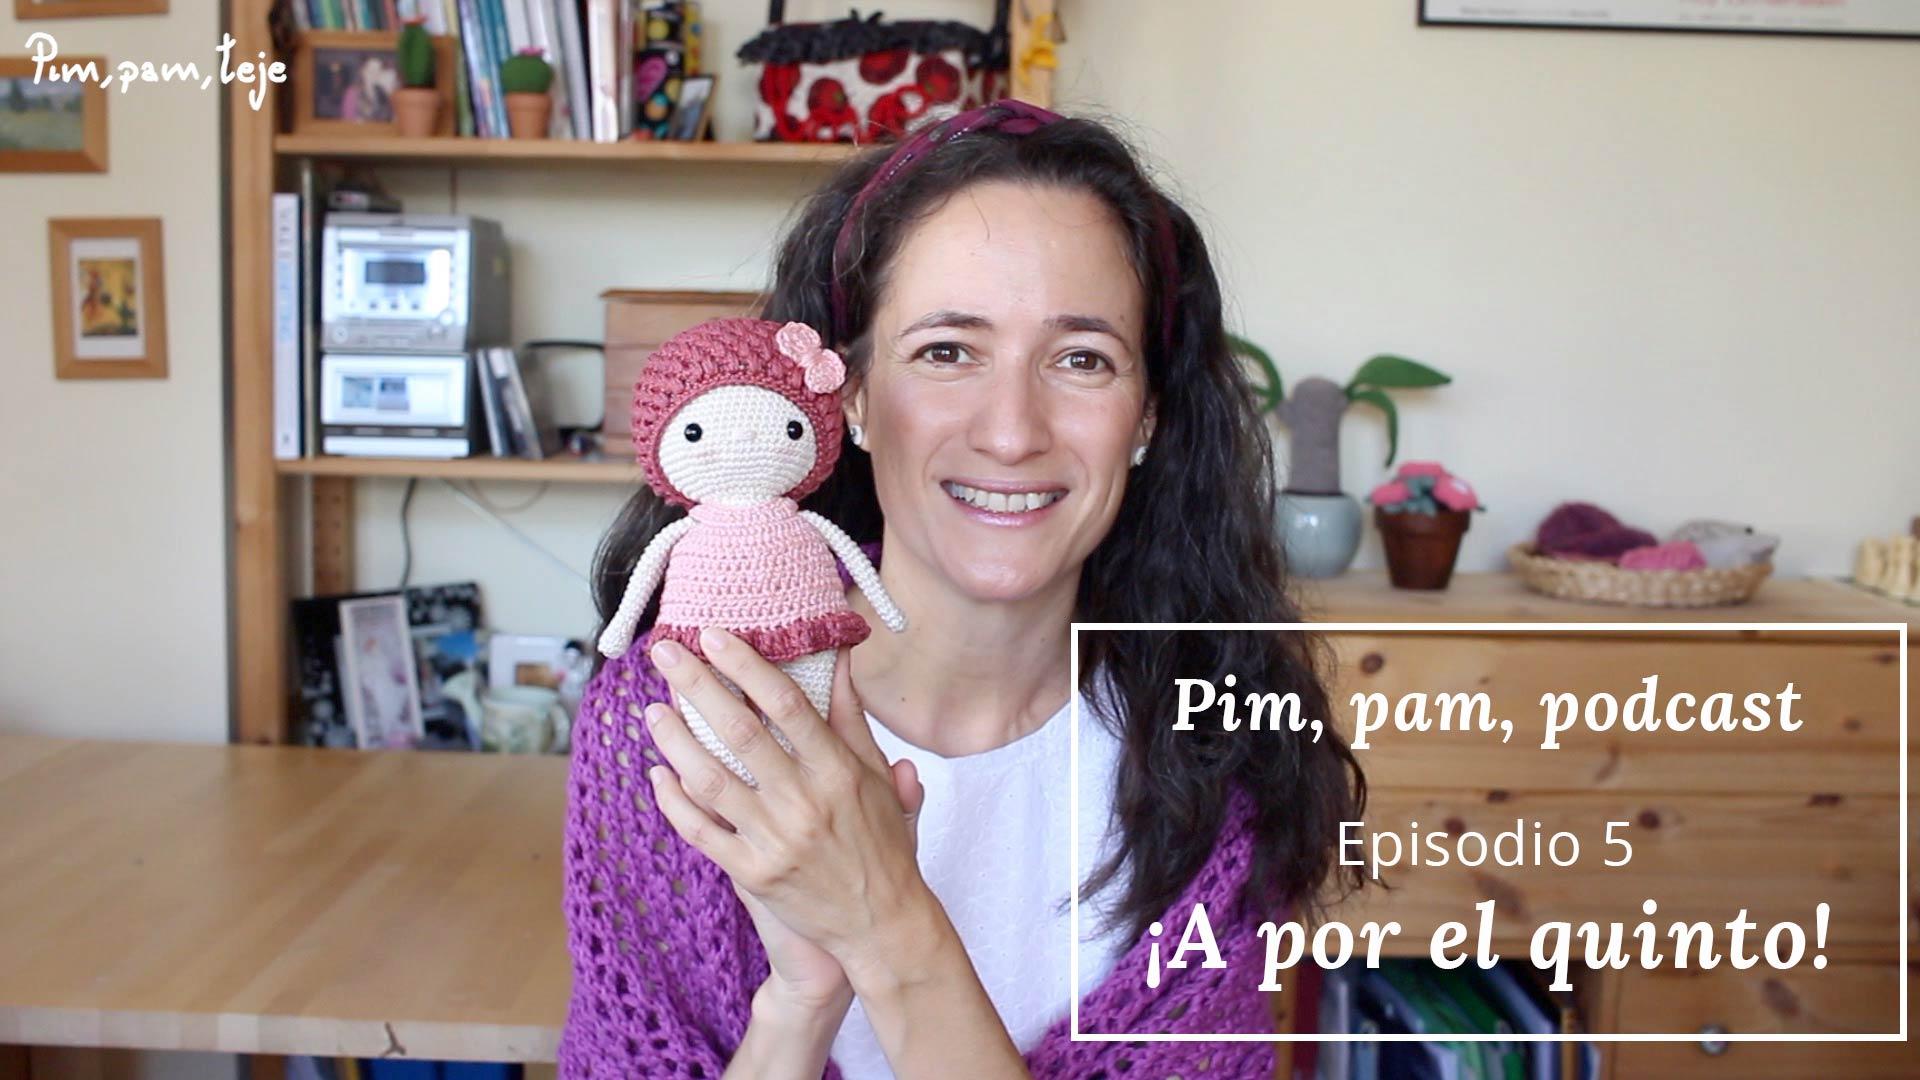 Episodio 5 del Pim, Pam, Podcast, un podcast de tejido en español